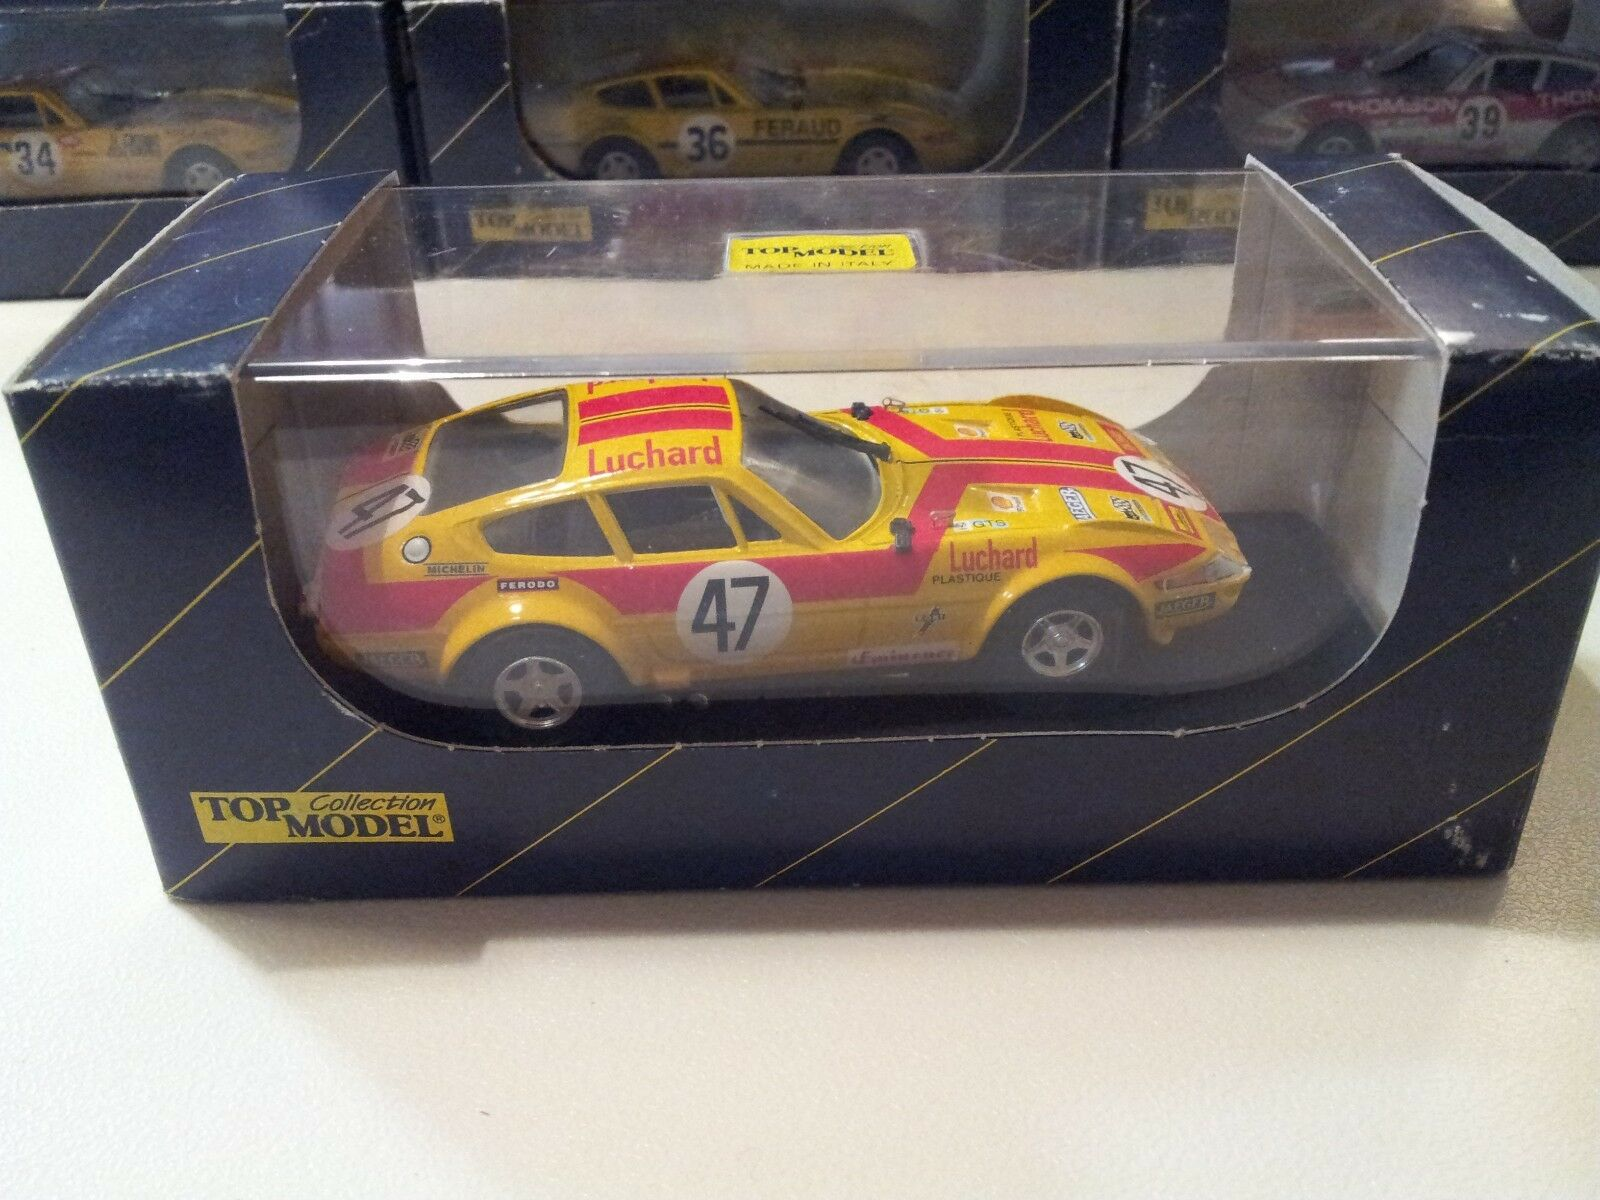 TOP MODEL Ferrari 365 GTB4 Daytona LeMans 1975 1975 1975 model 1 43 scale (Made in ) 9dda3c